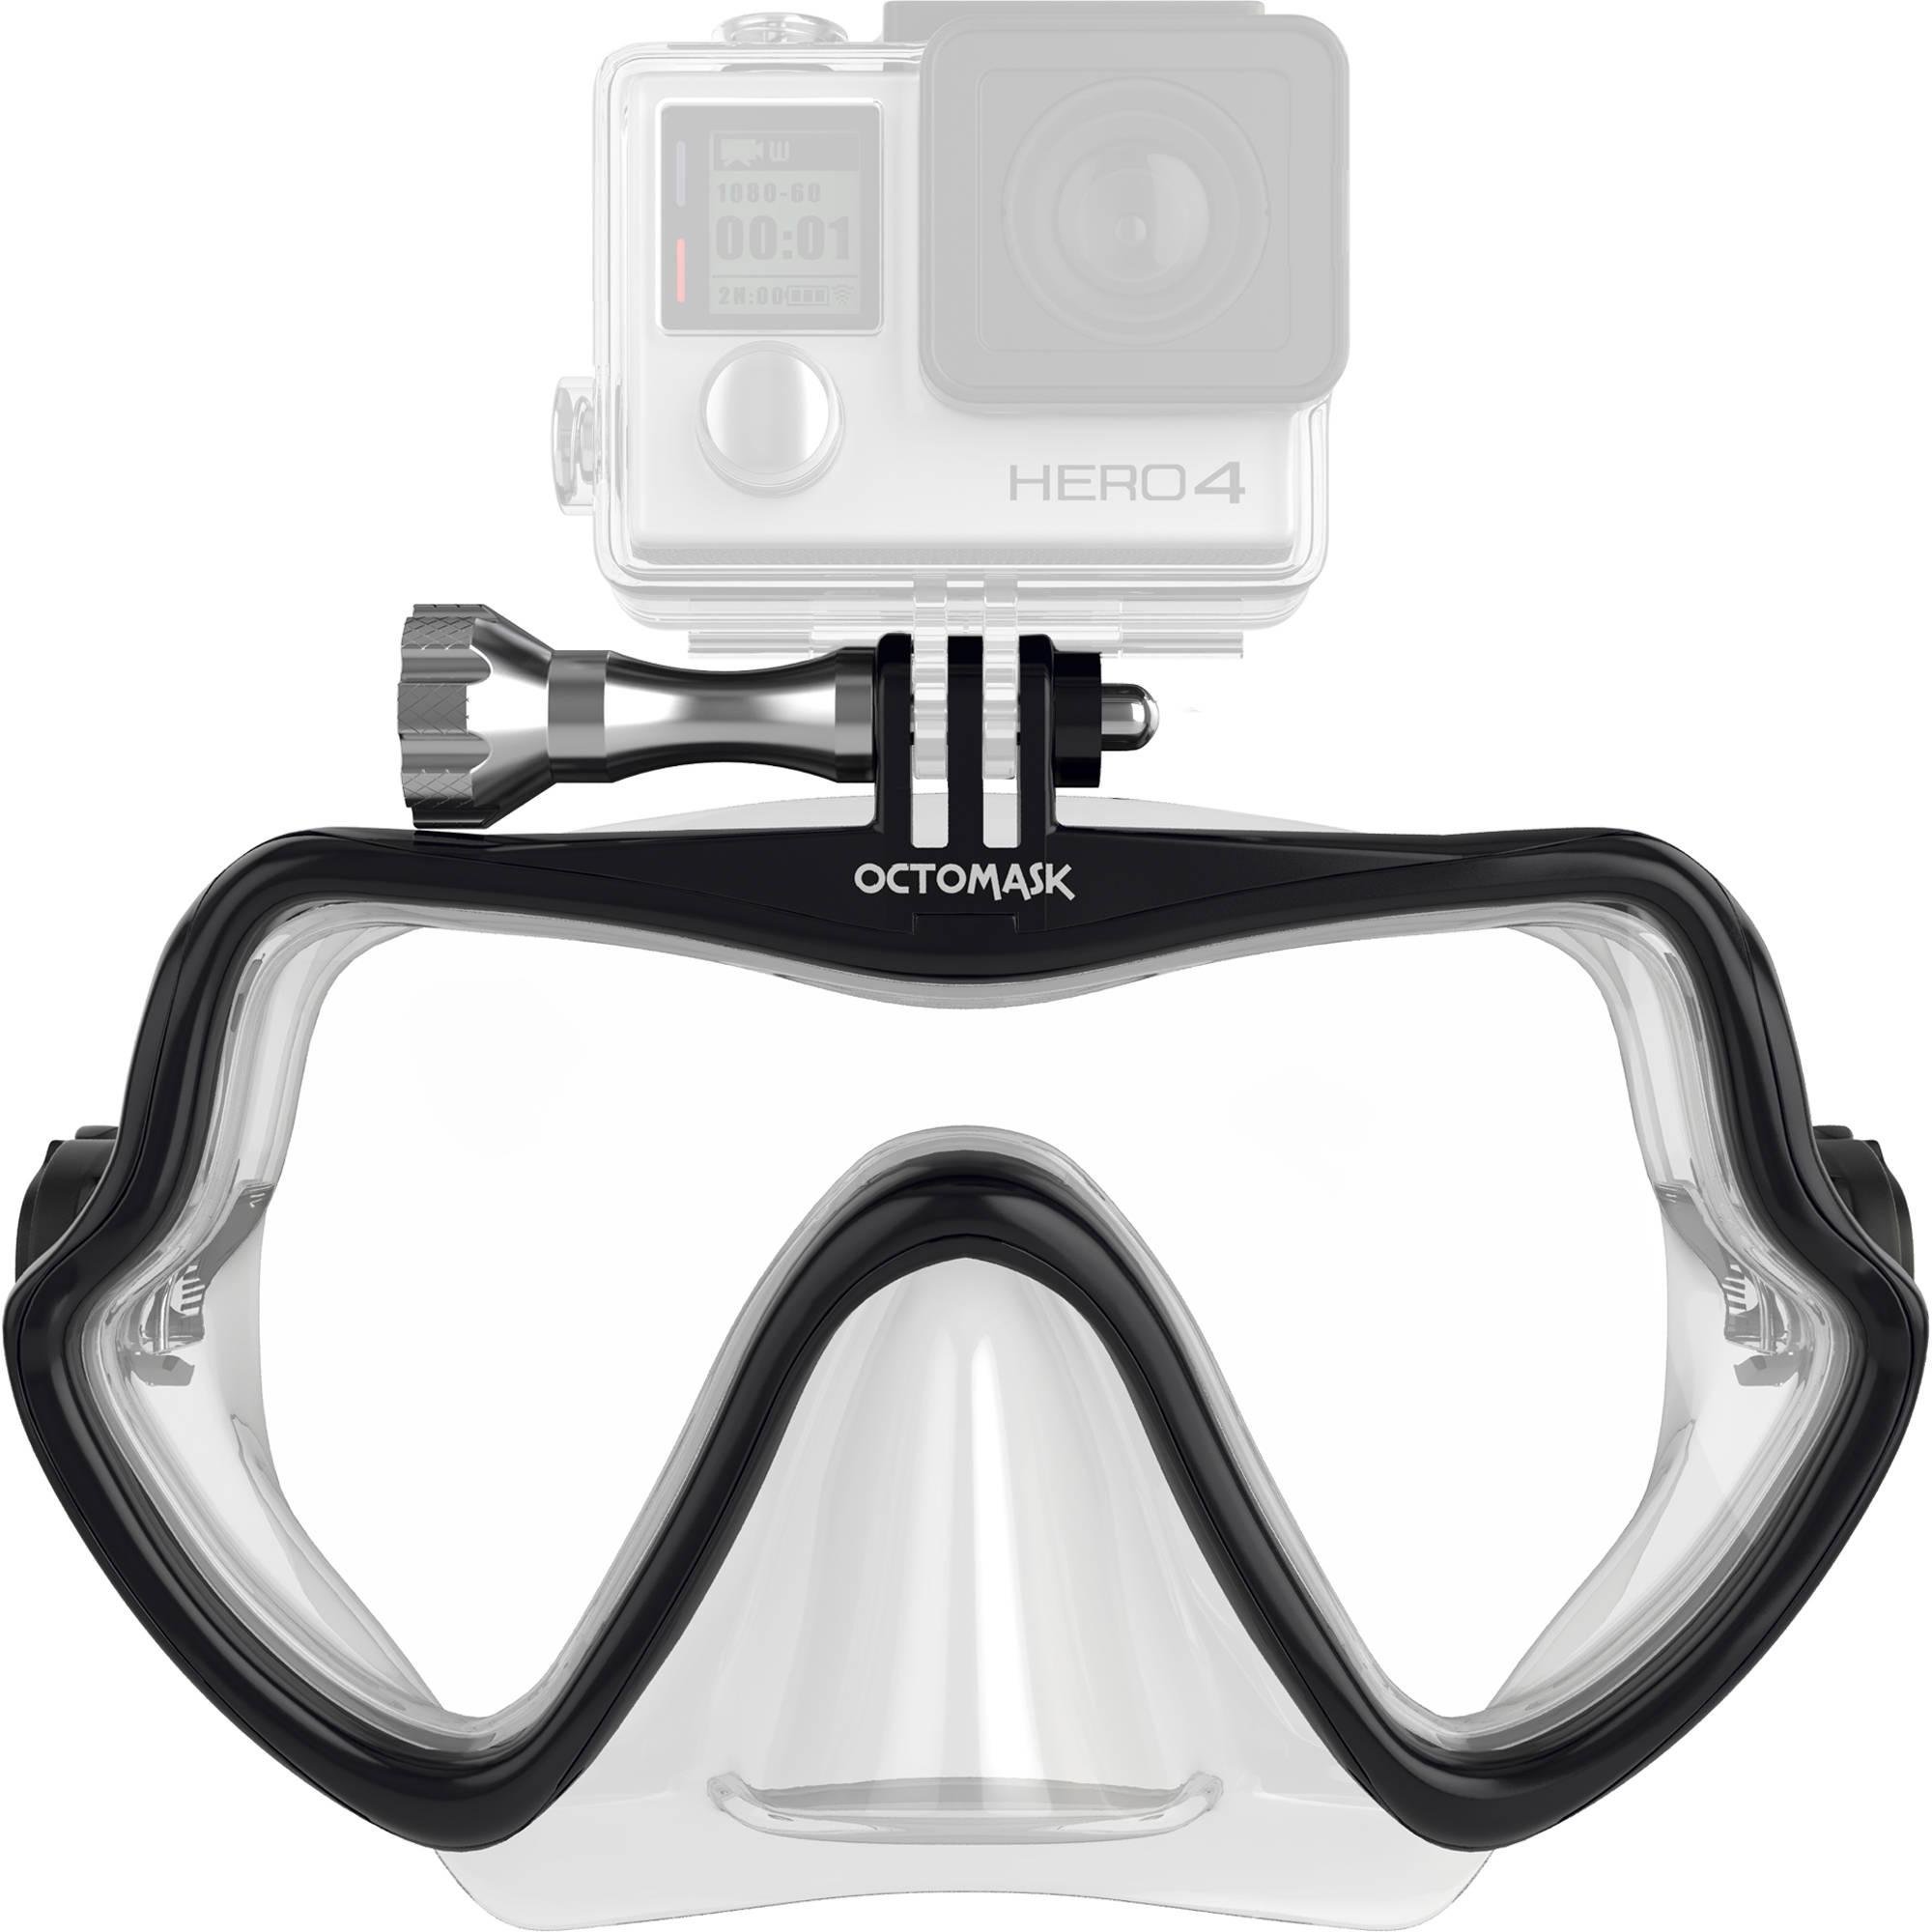 7b1dc9c4cfc6 OCTOMASK Frameless Scuba Mask for GoPro Camera (Clear) 202 B H